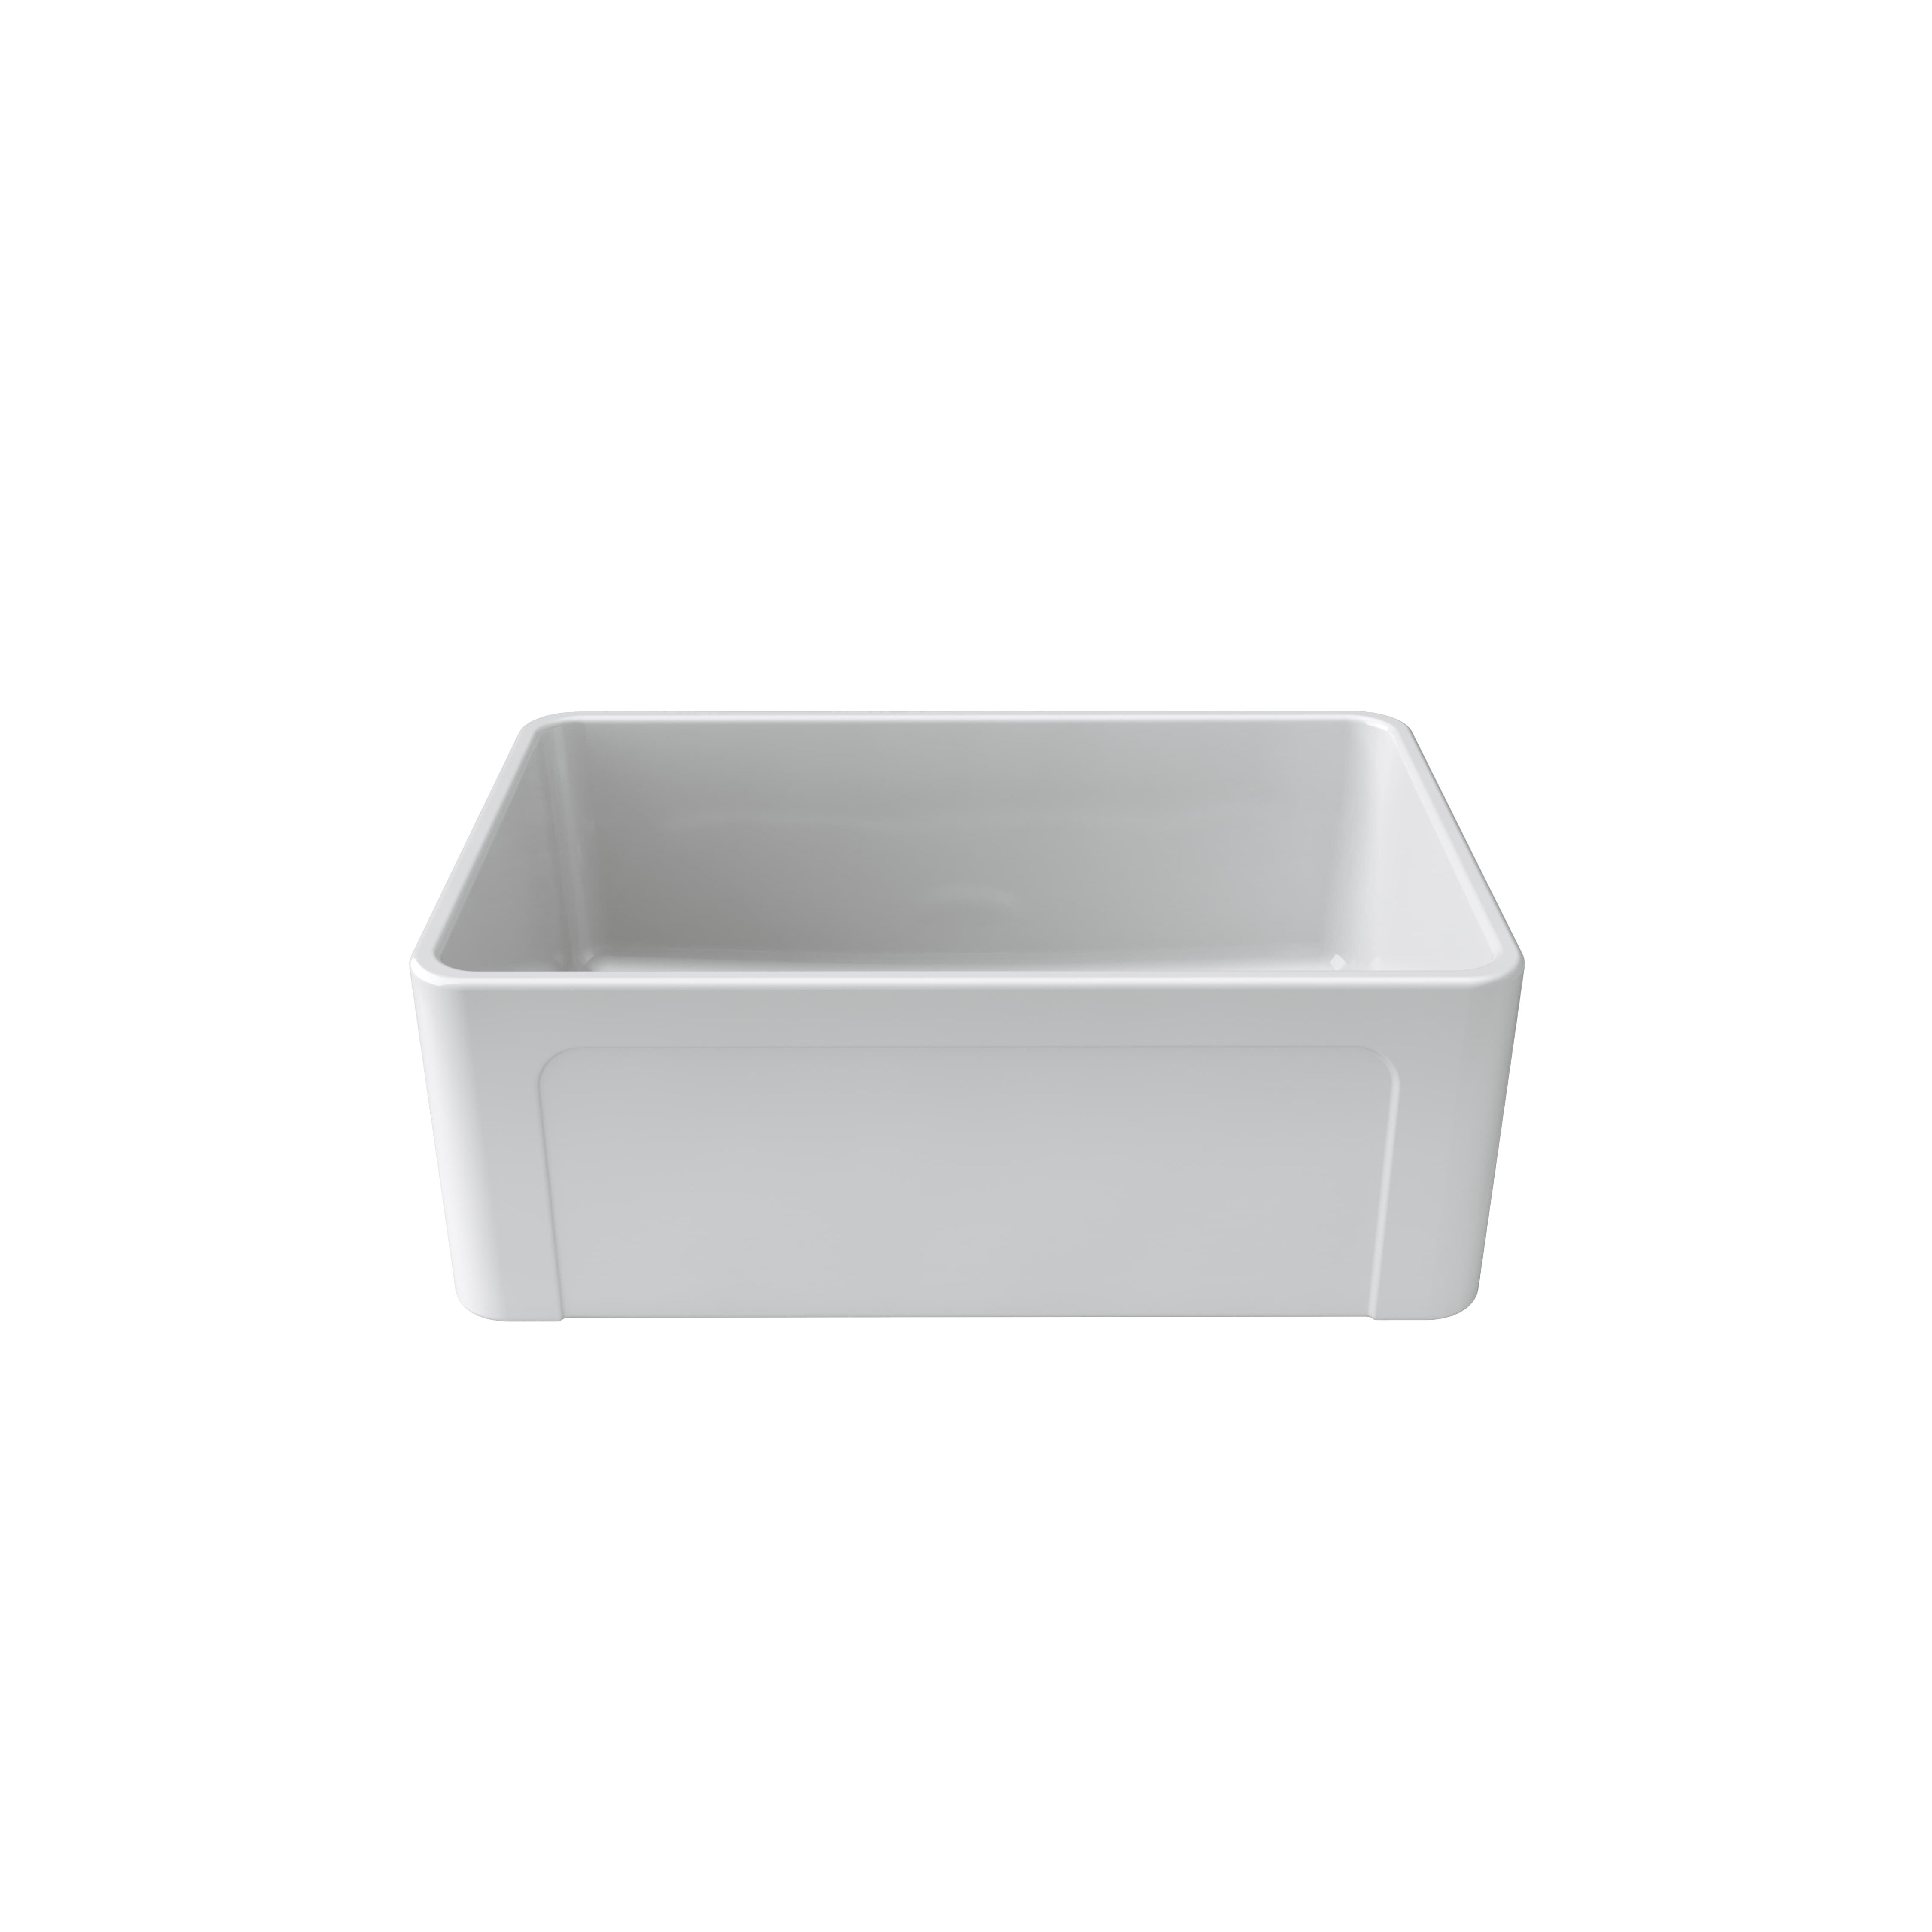 "LaToscana 27"" x 18"" Fireclay Kitchen Sink"